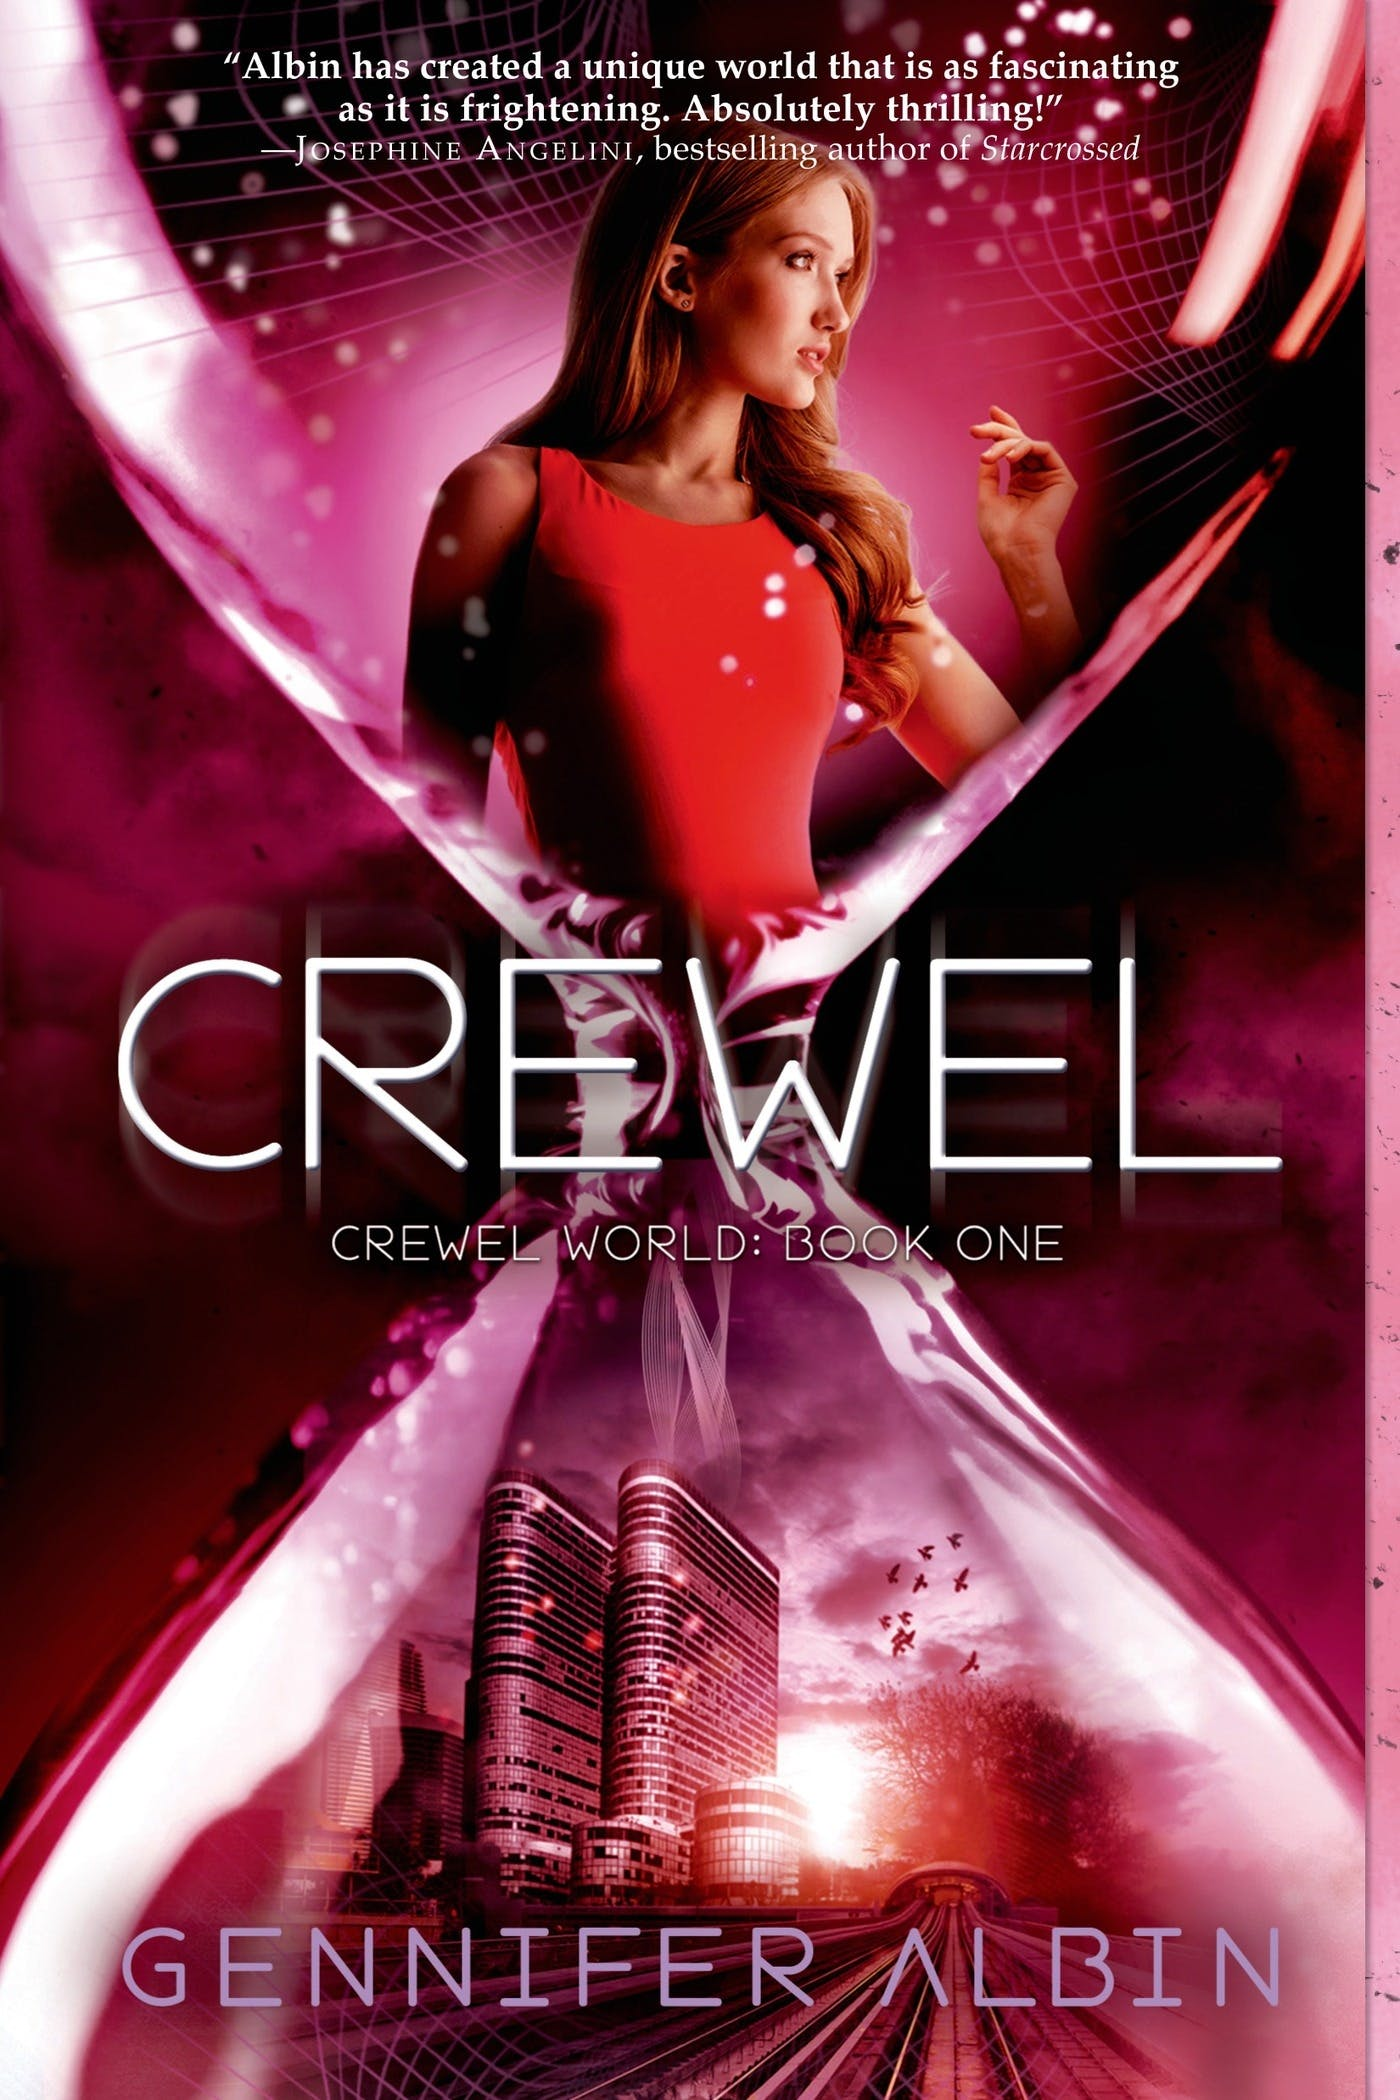 Image of Crewel